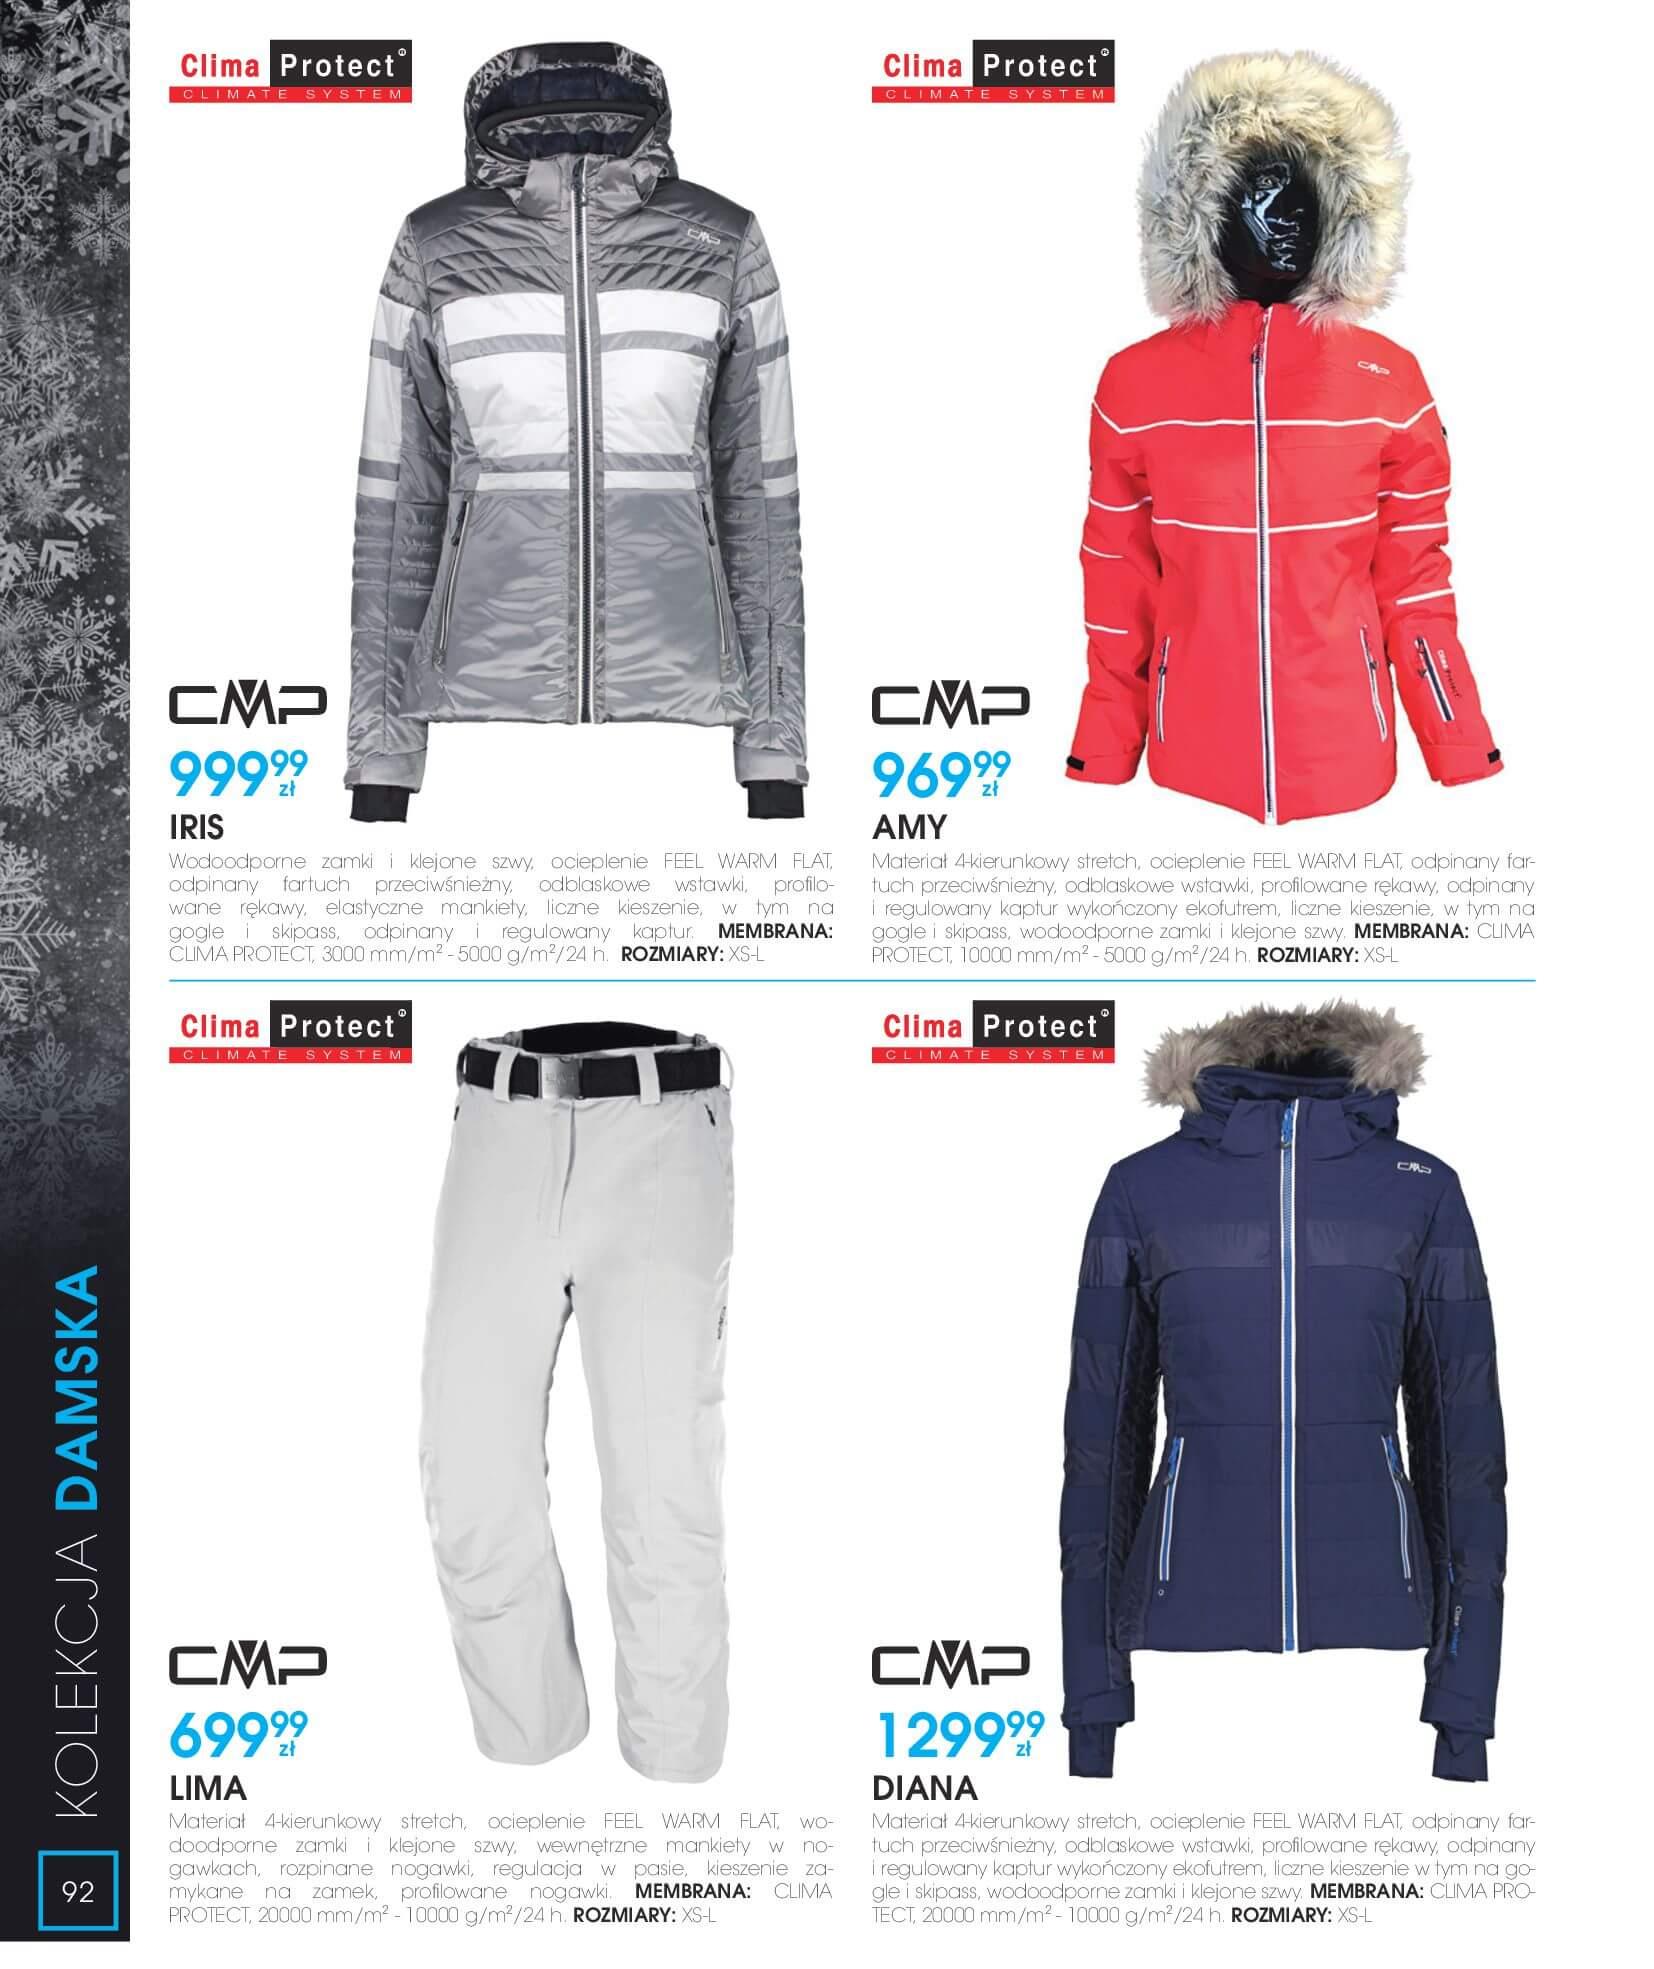 Gazetka Go Sport - Katalog Zima 2017/2018-12.11.2017-28.02.2018-page-92